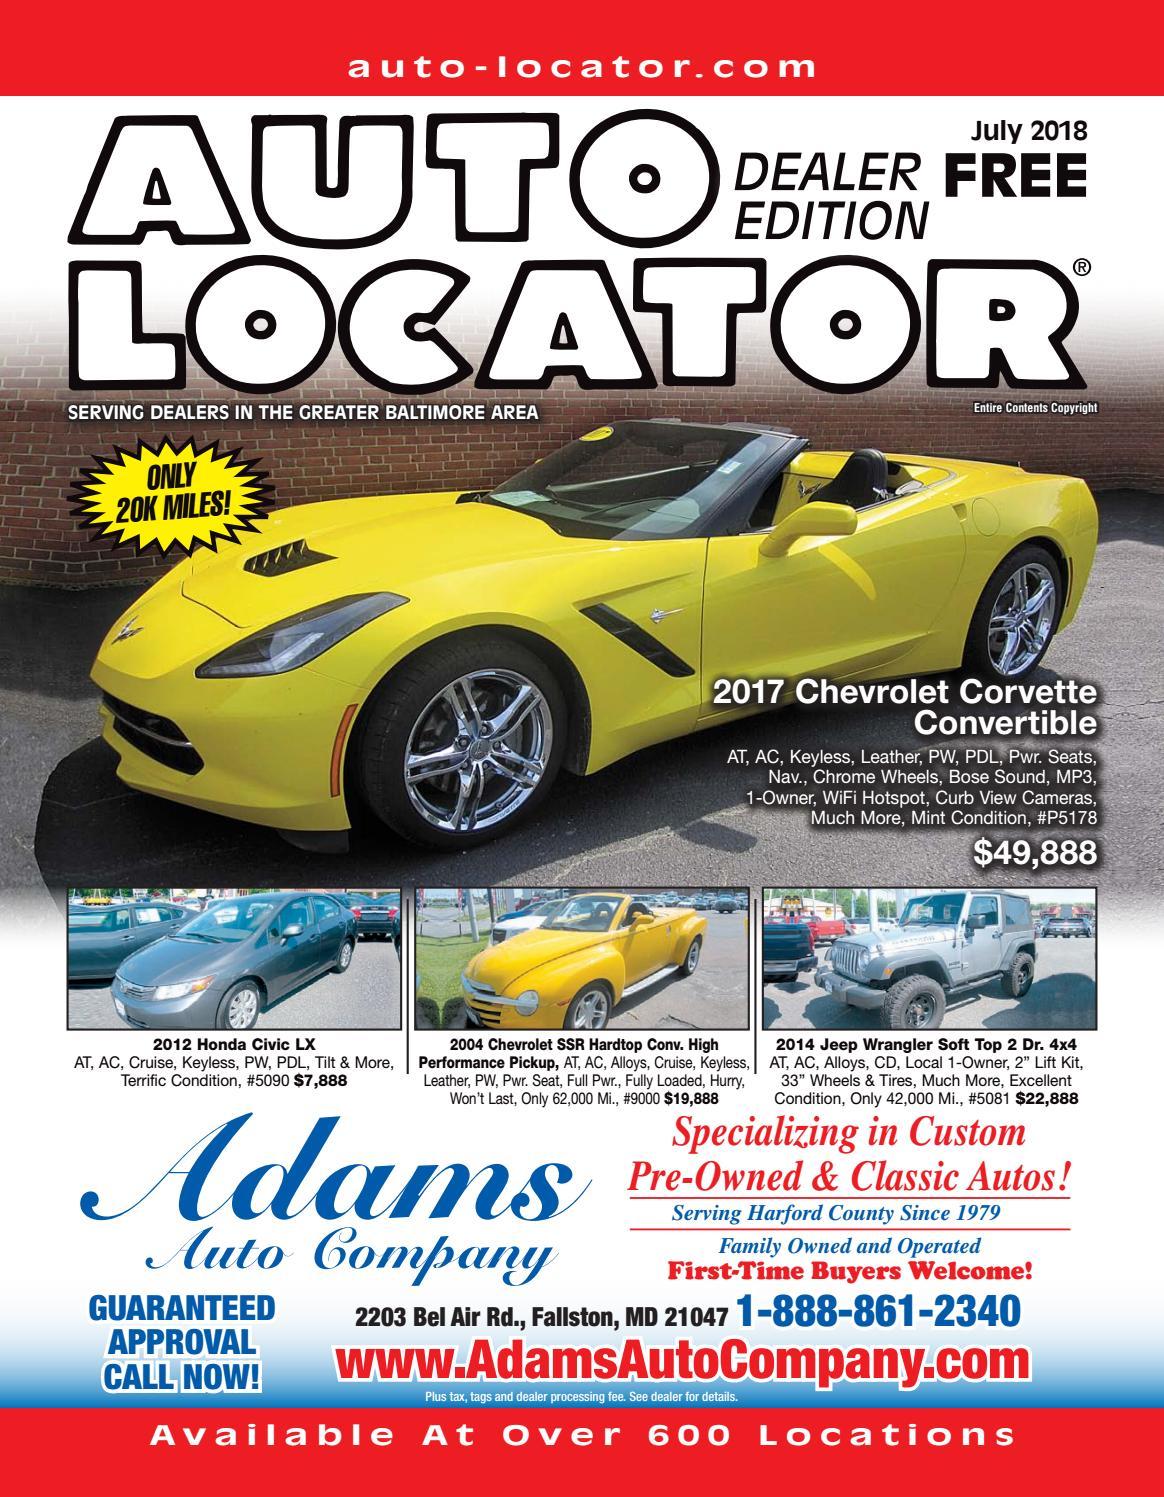 06-25-18 Auto Locator Dealer Edition by Auto Locator Dealer - issuu